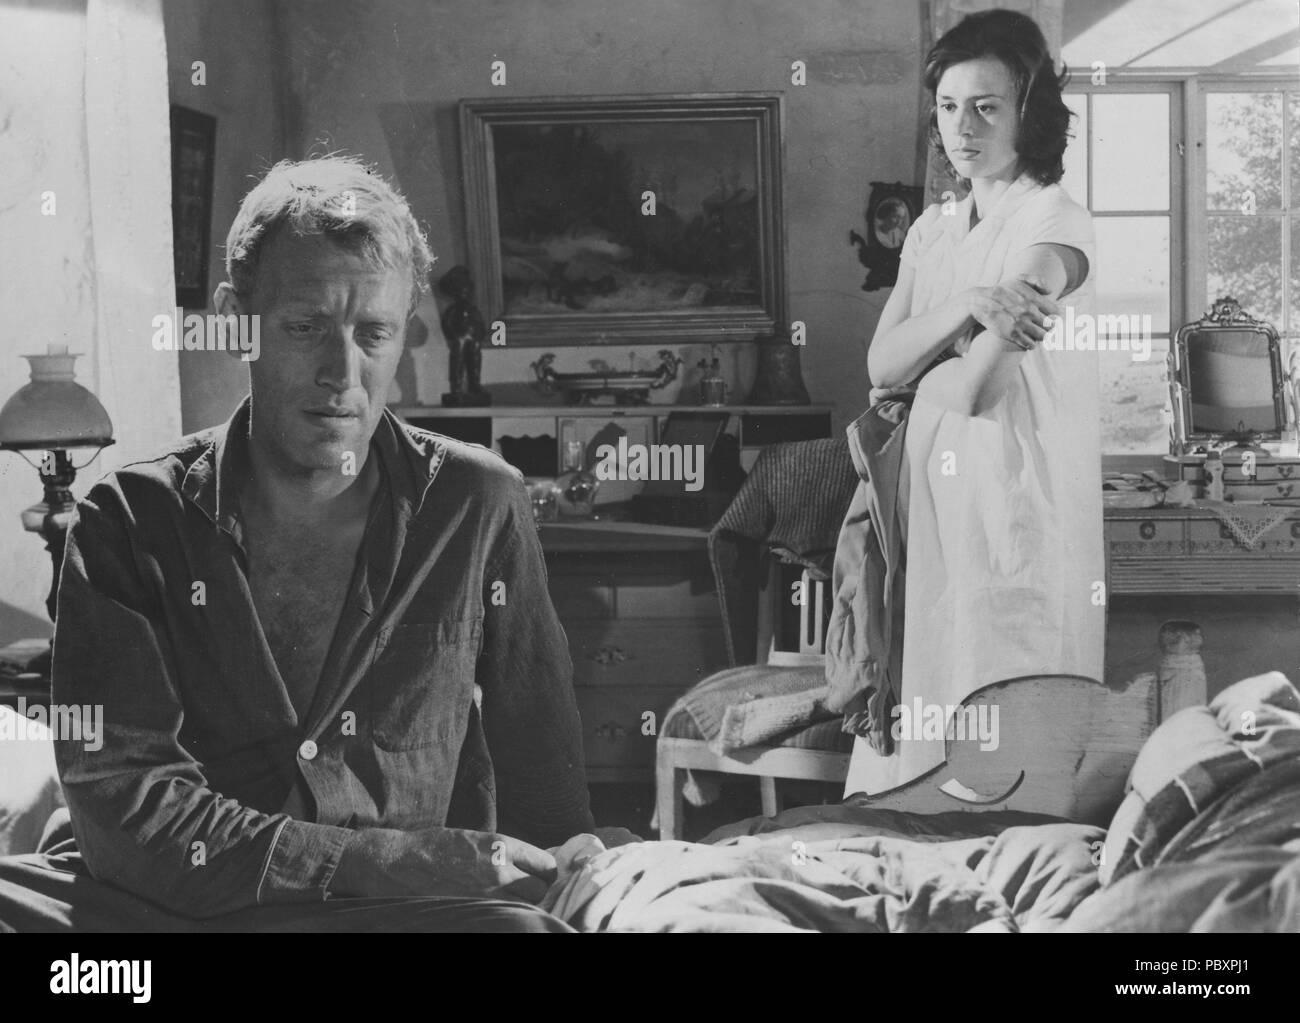 Through a Glass Darkly. Swedish film by Ingmar Bergman 1961 starring Harriet Andersson and Max von Sydow.  Ingmar Bergman. 1918-2007.  Swedish film director. Stock Photo